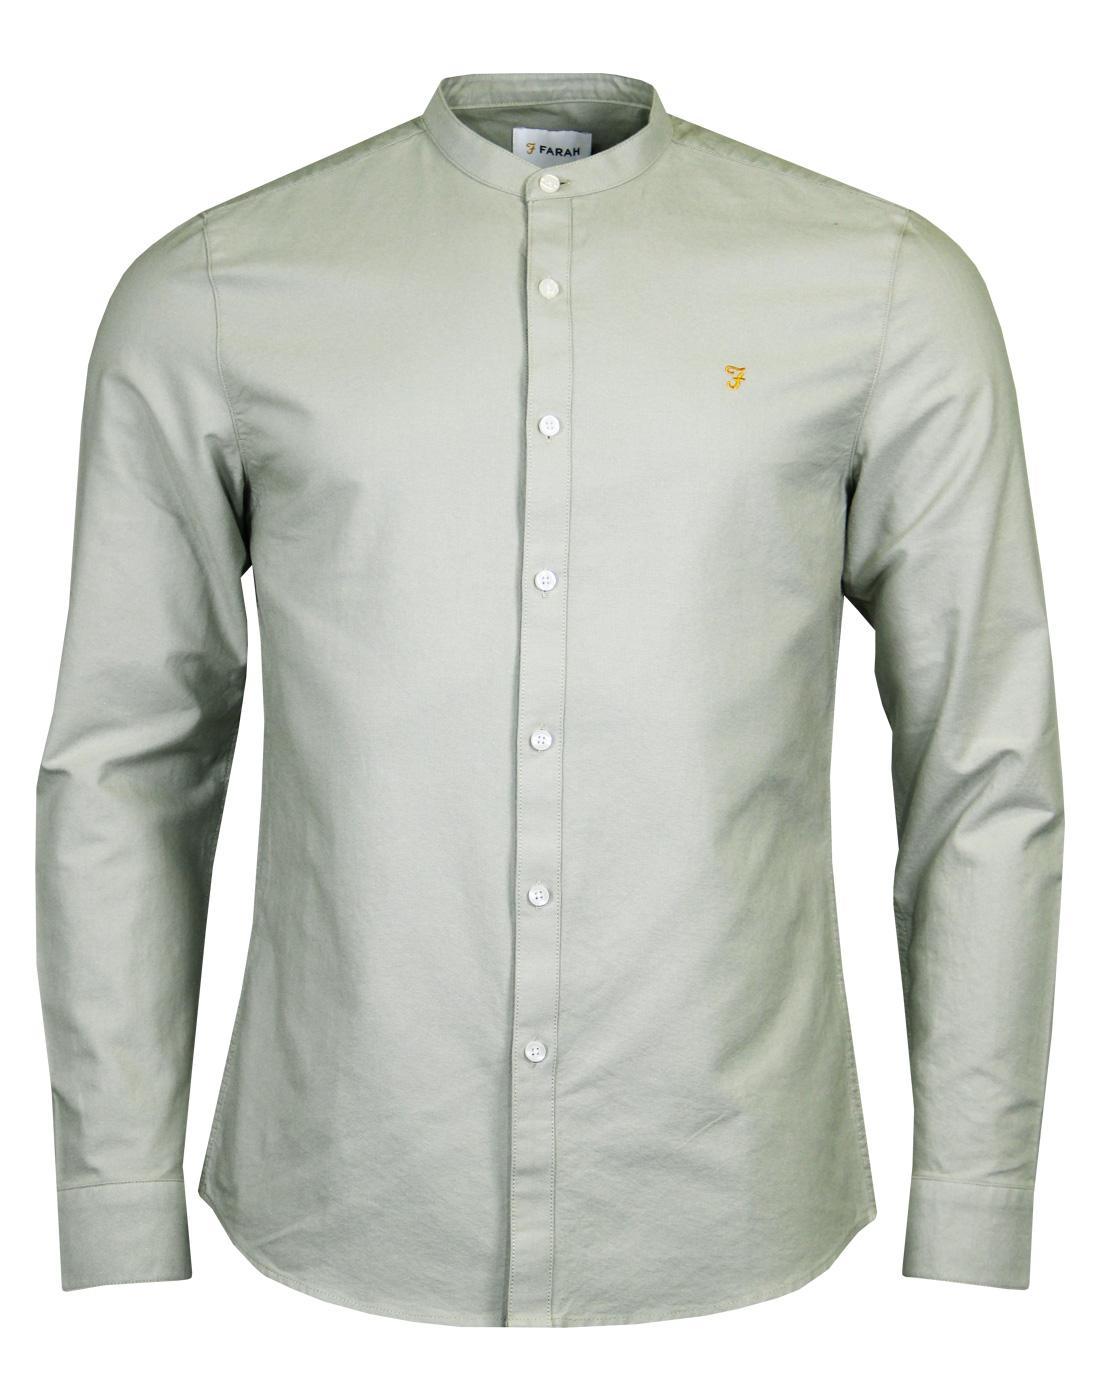 Brewer FARAH Mod Grandad Collar Oxford Shirt BG